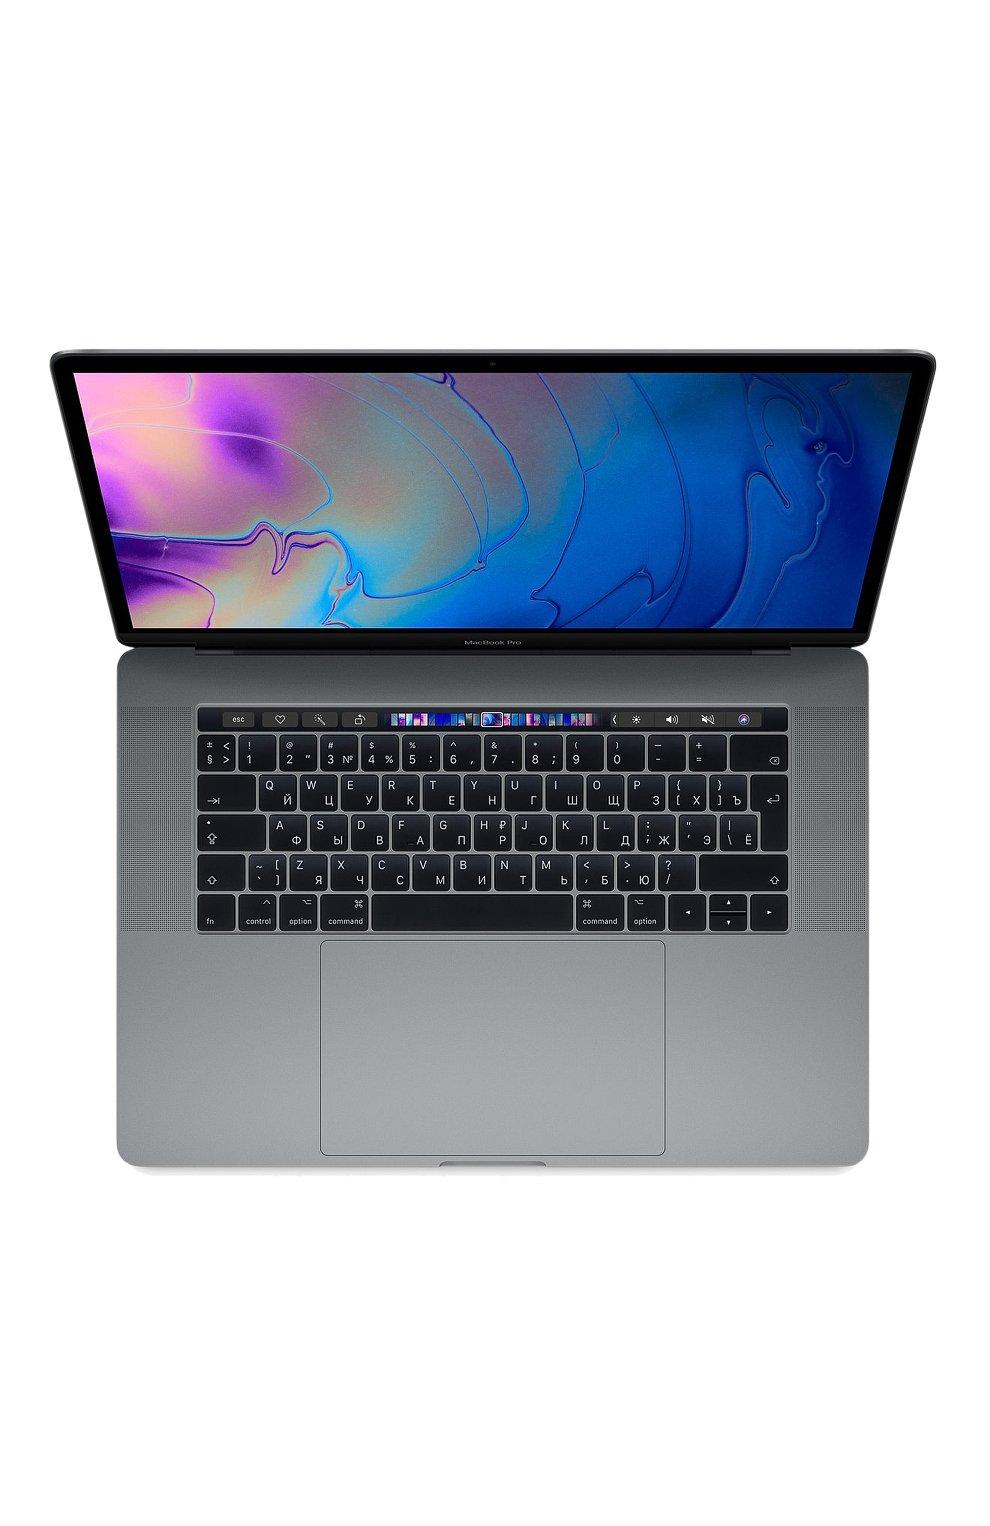 "MacBook Pro 15"" с панелью Touch Bar со встроенным датчиком Touch ID 6-Core i7 2.2GHz 256GB Space Gray | Фото №1"